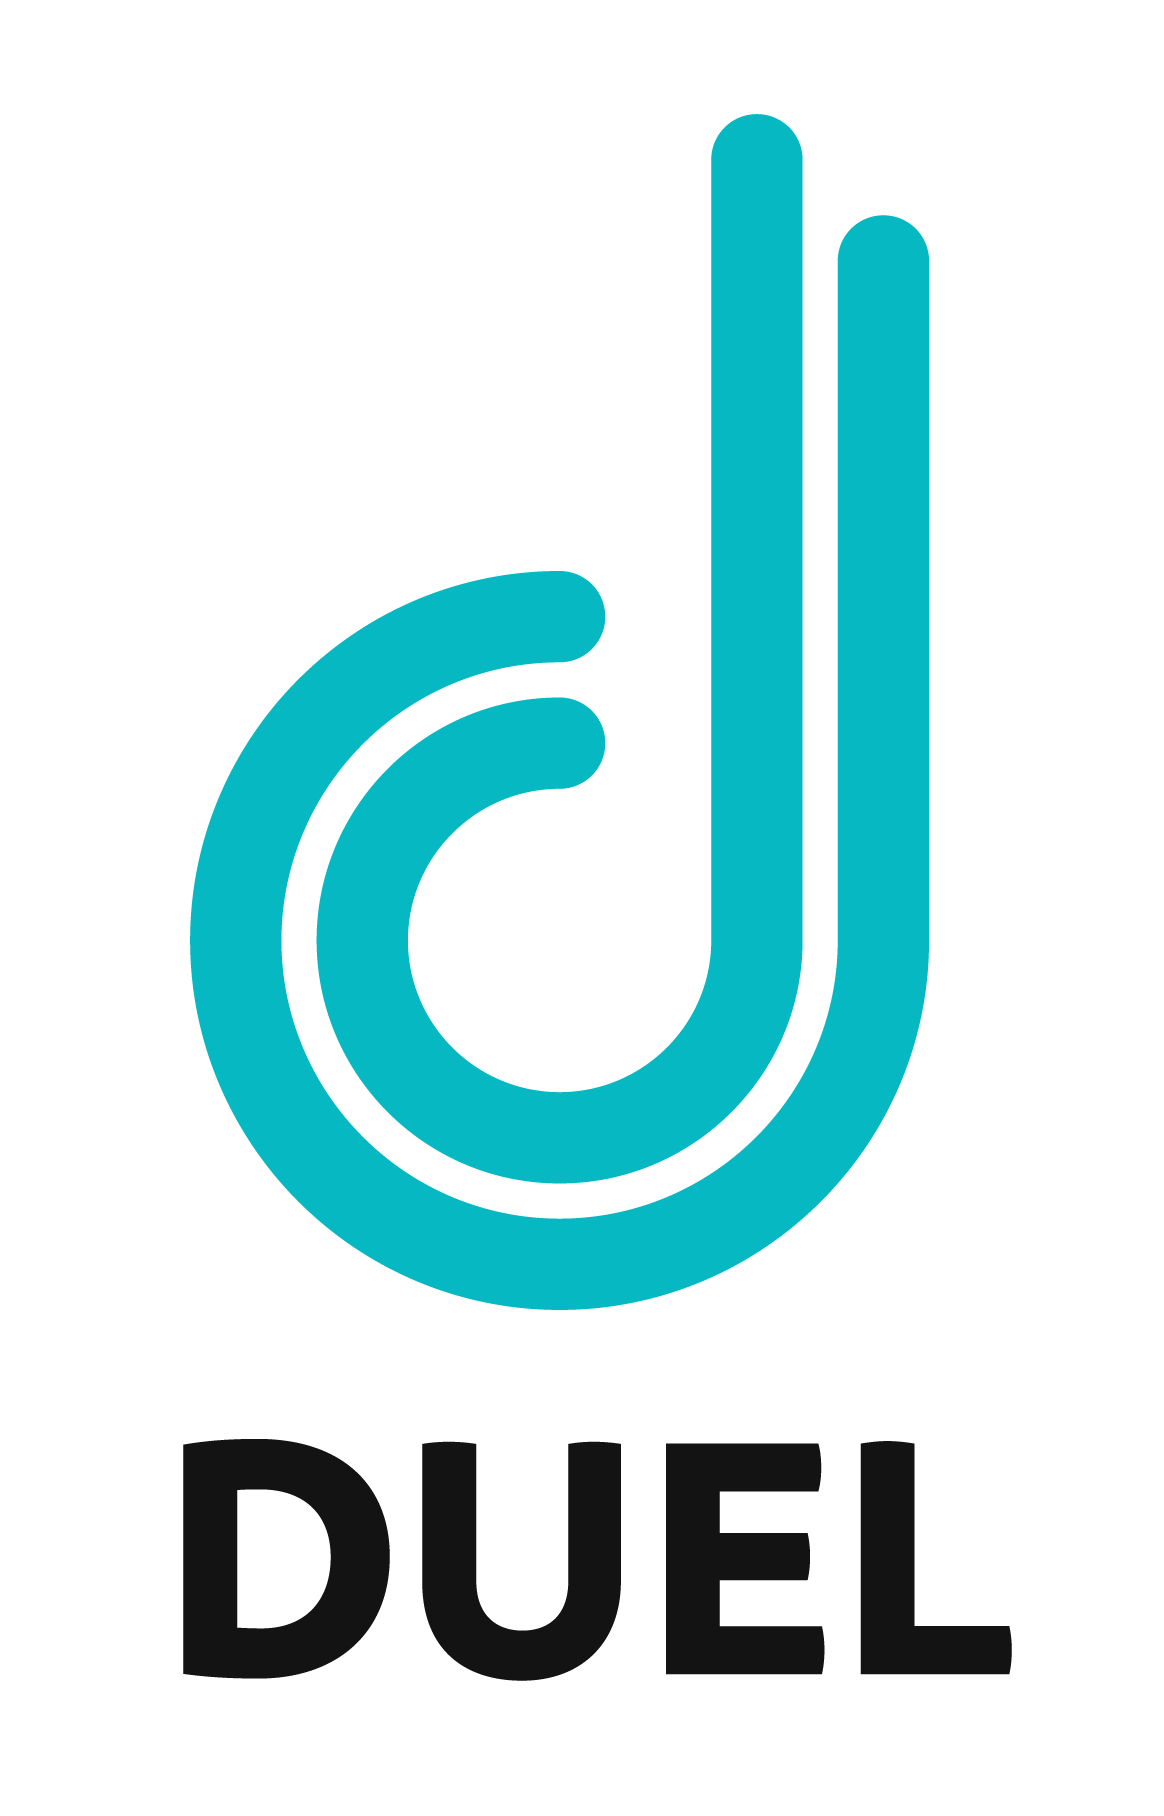 Duel Tech Company Logo